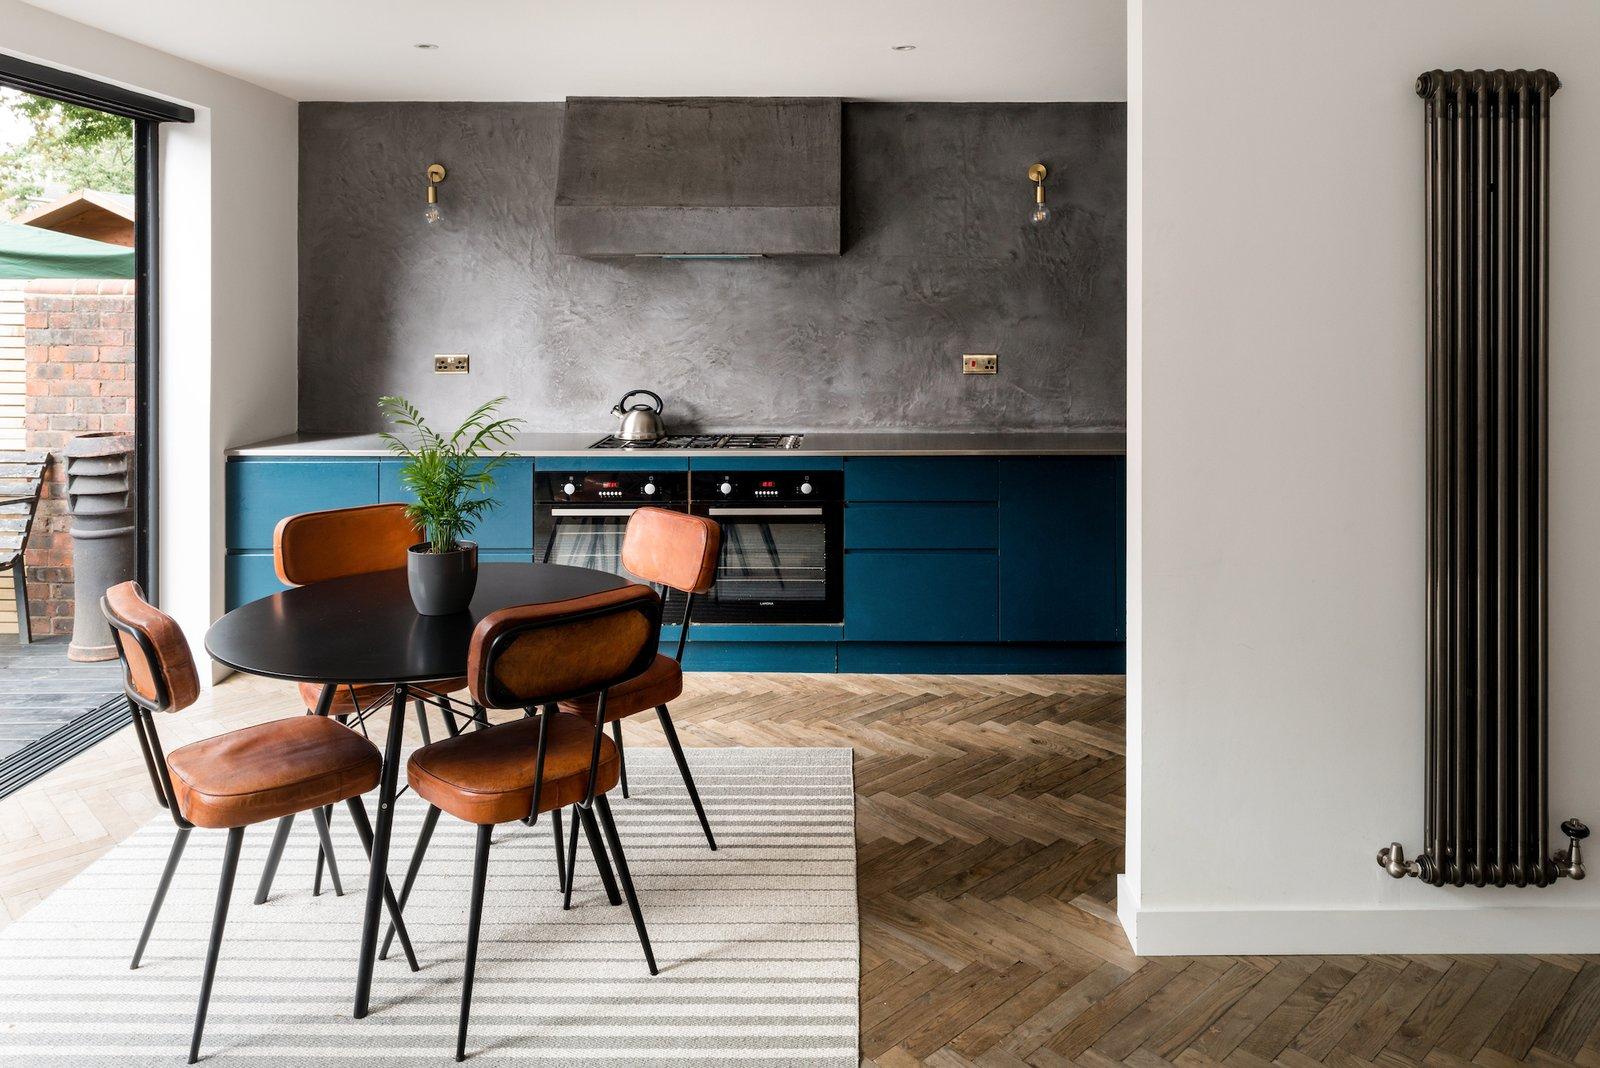 Kitchen at Two and a Half Storey House by Bradley Van Der Straeten Architects.